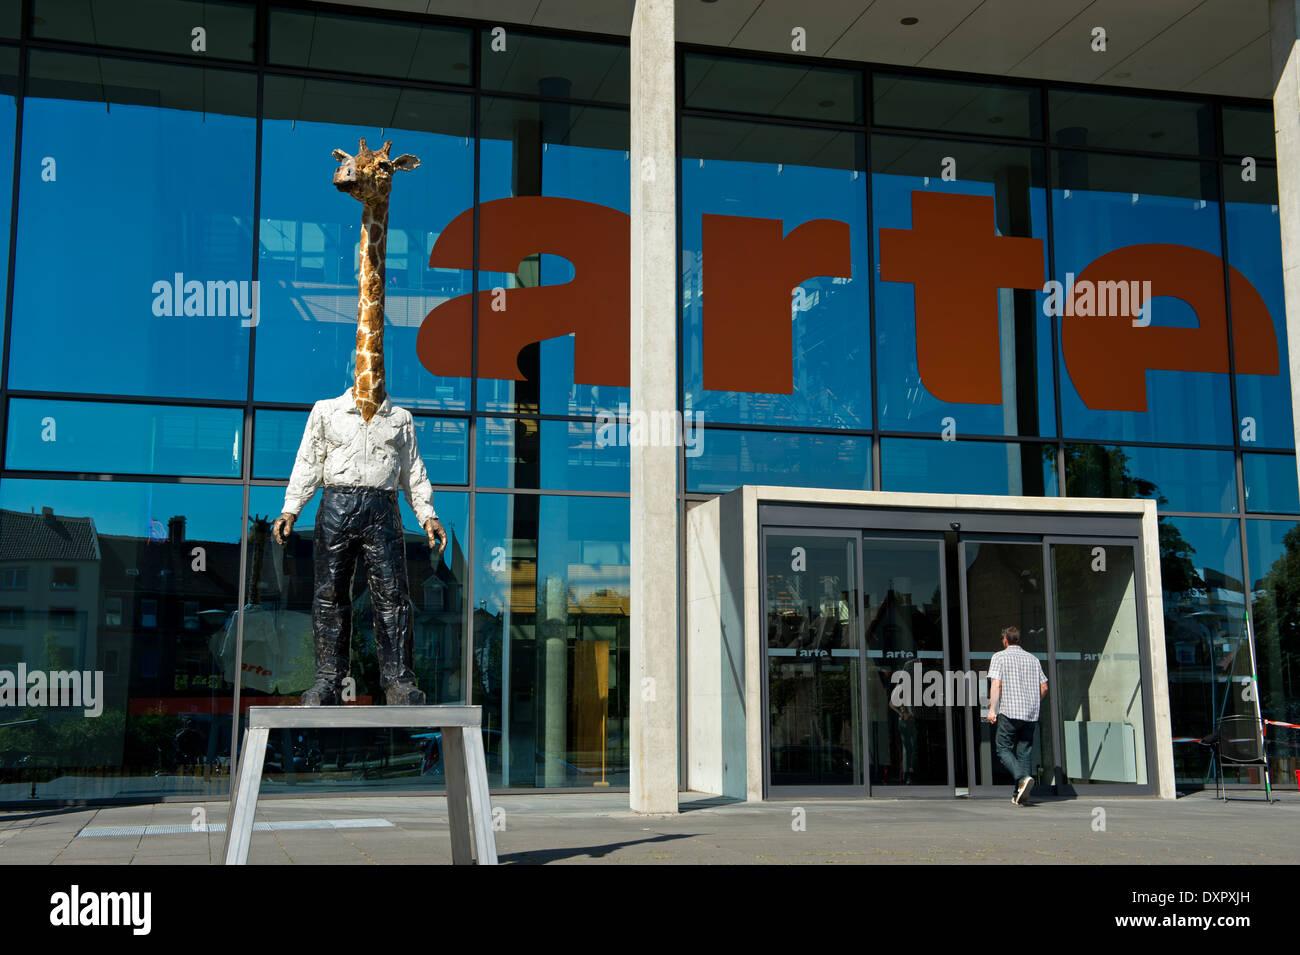 Sculpture Homme-Girafe by Stefan Balkenhol at the headquarters of the Franco-German TV network ARTE, Strasbourg, Alsace, France - Stock Image